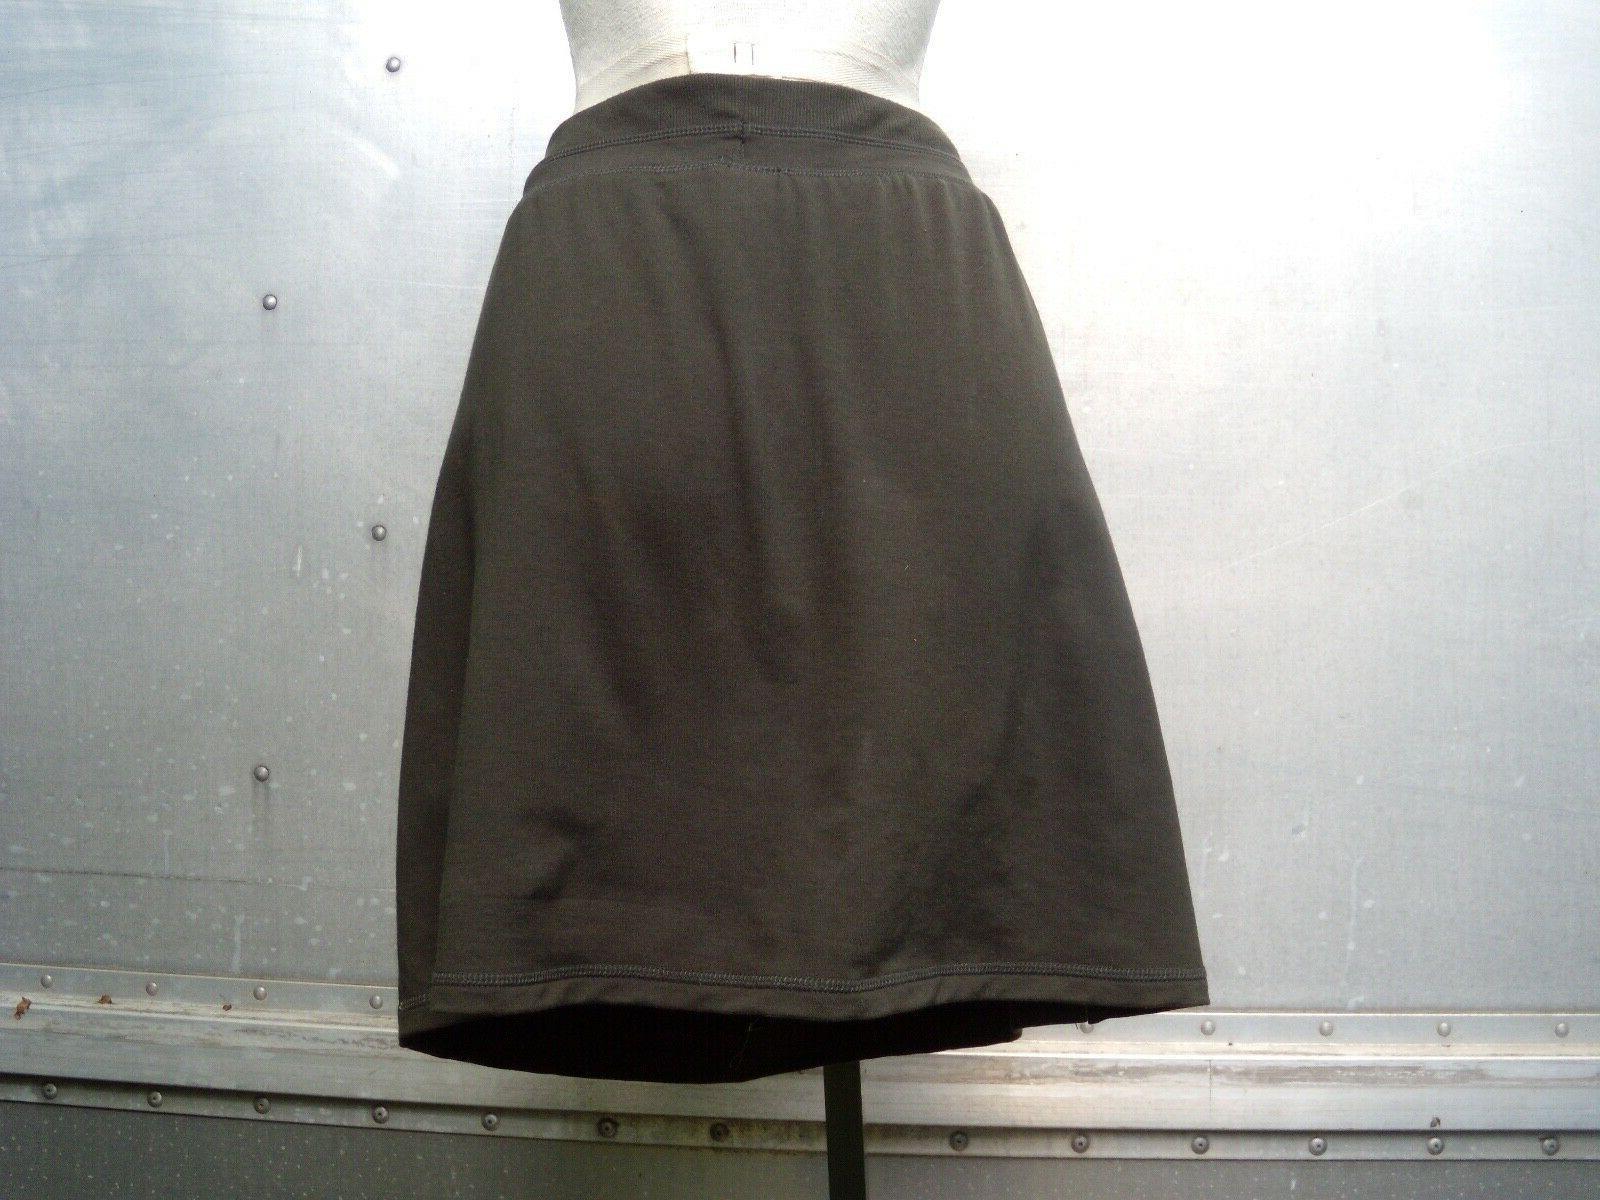 Green Jersey Skort - Wm's XXL blend, Pockets